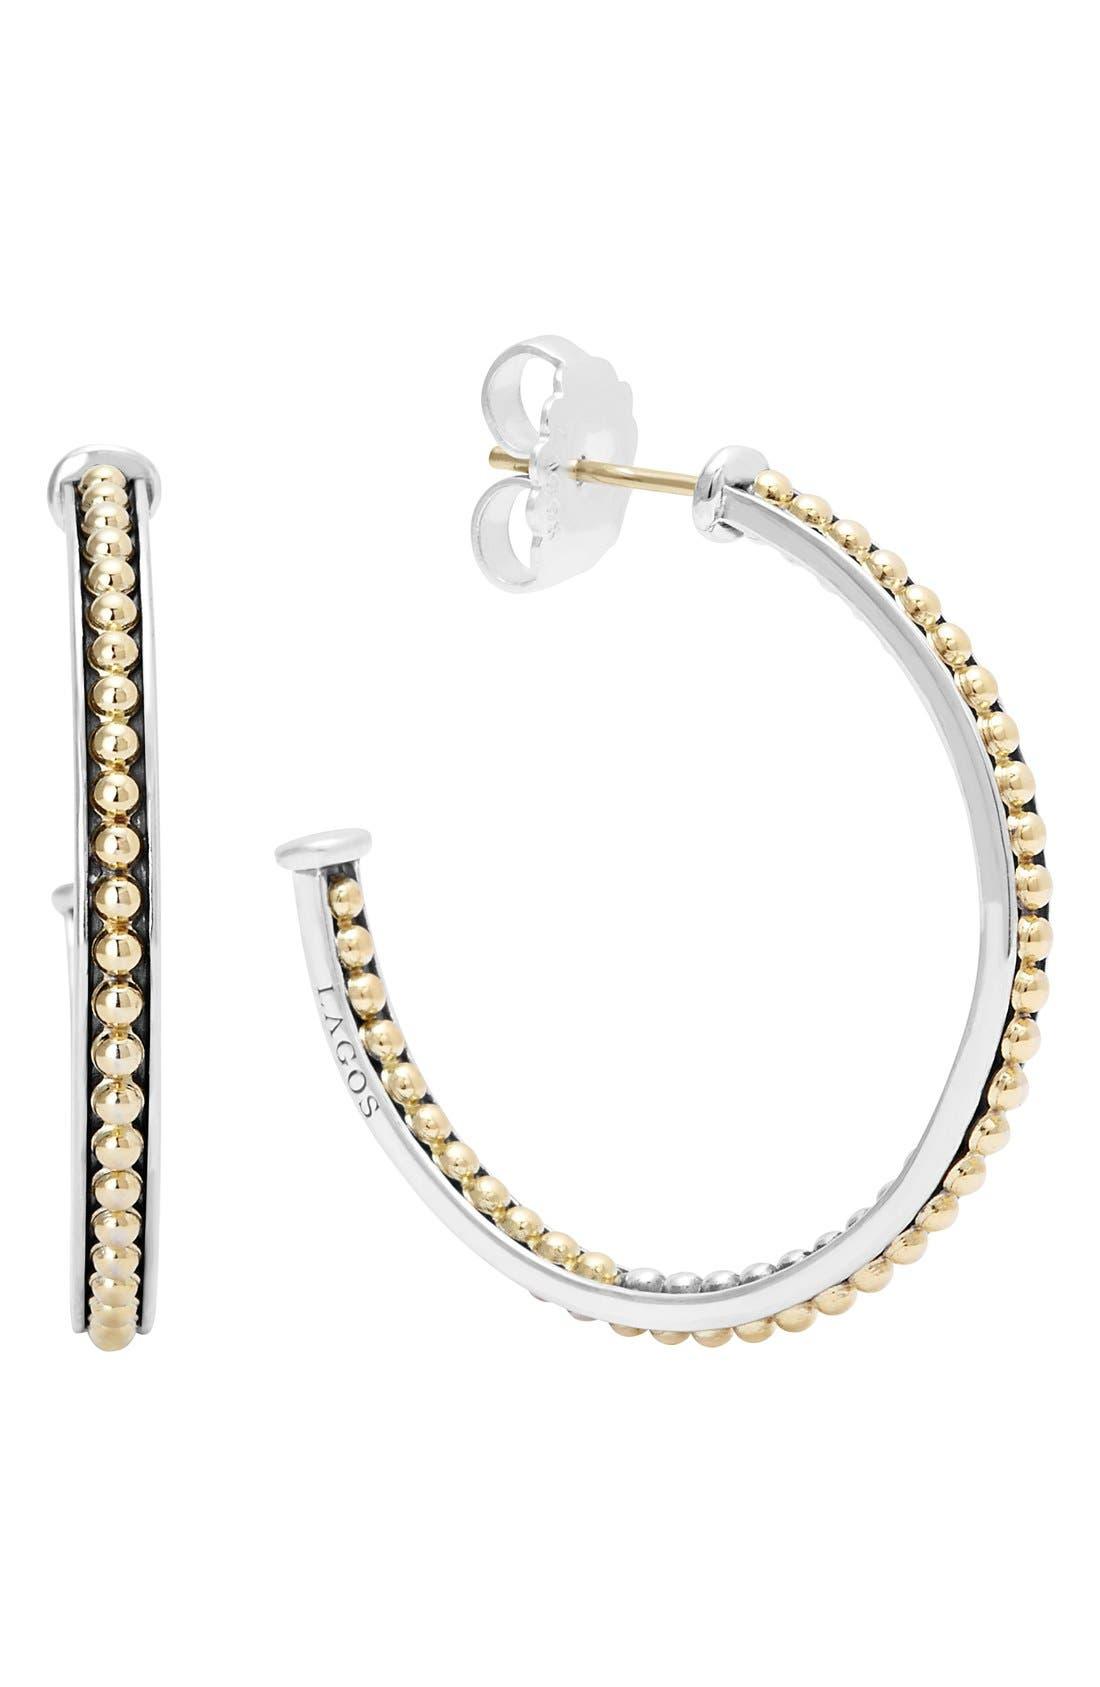 Alternate Image 1 Selected - LAGOS 'Enso' Caviar Hoop Earrings